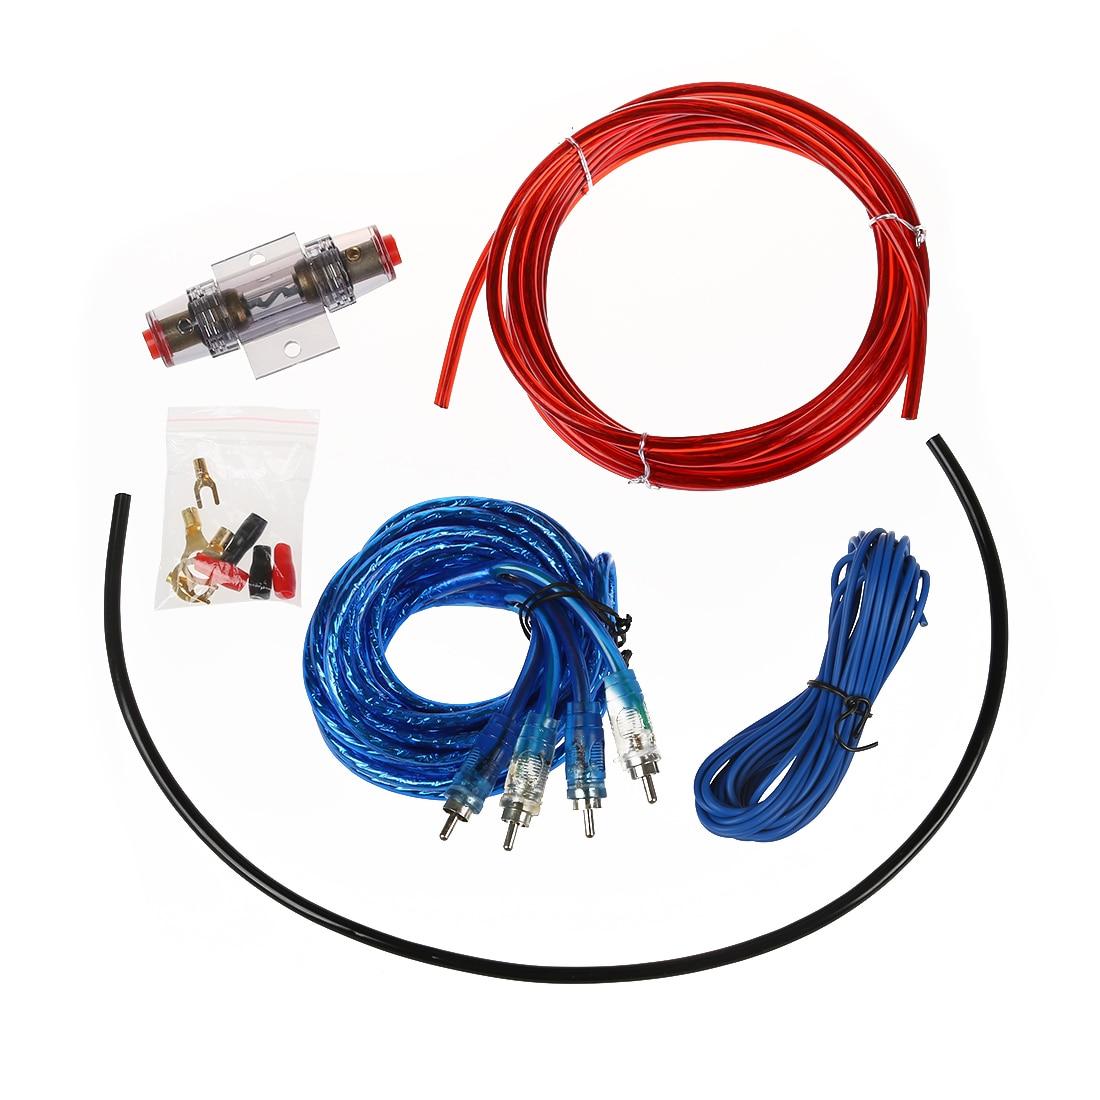 1500w Car Audio Wire Wiring Amplifier Subwoofer Speaker Installation Best Kit Aeproductgetsubject